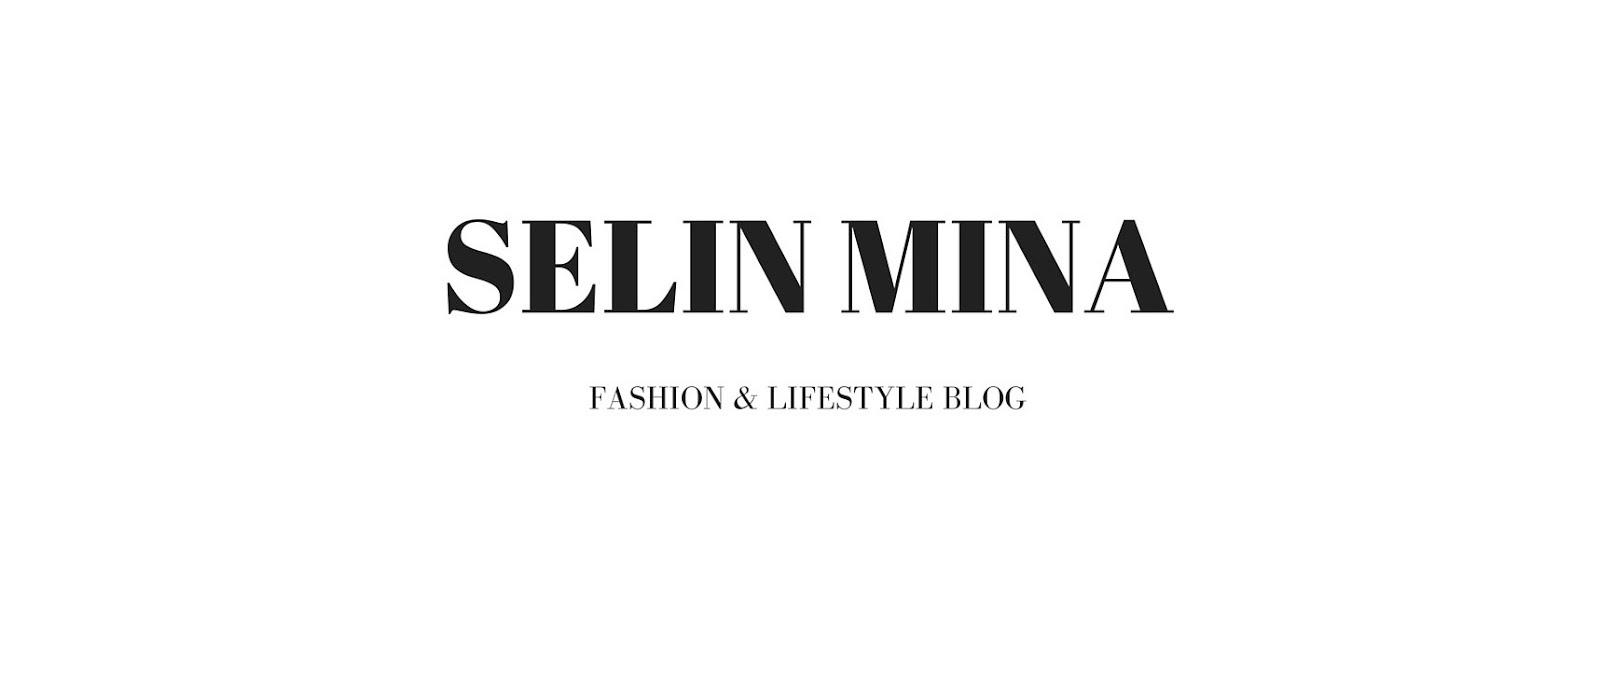 Selin Mina - Modeblog aus München / Fashionblog from Munich